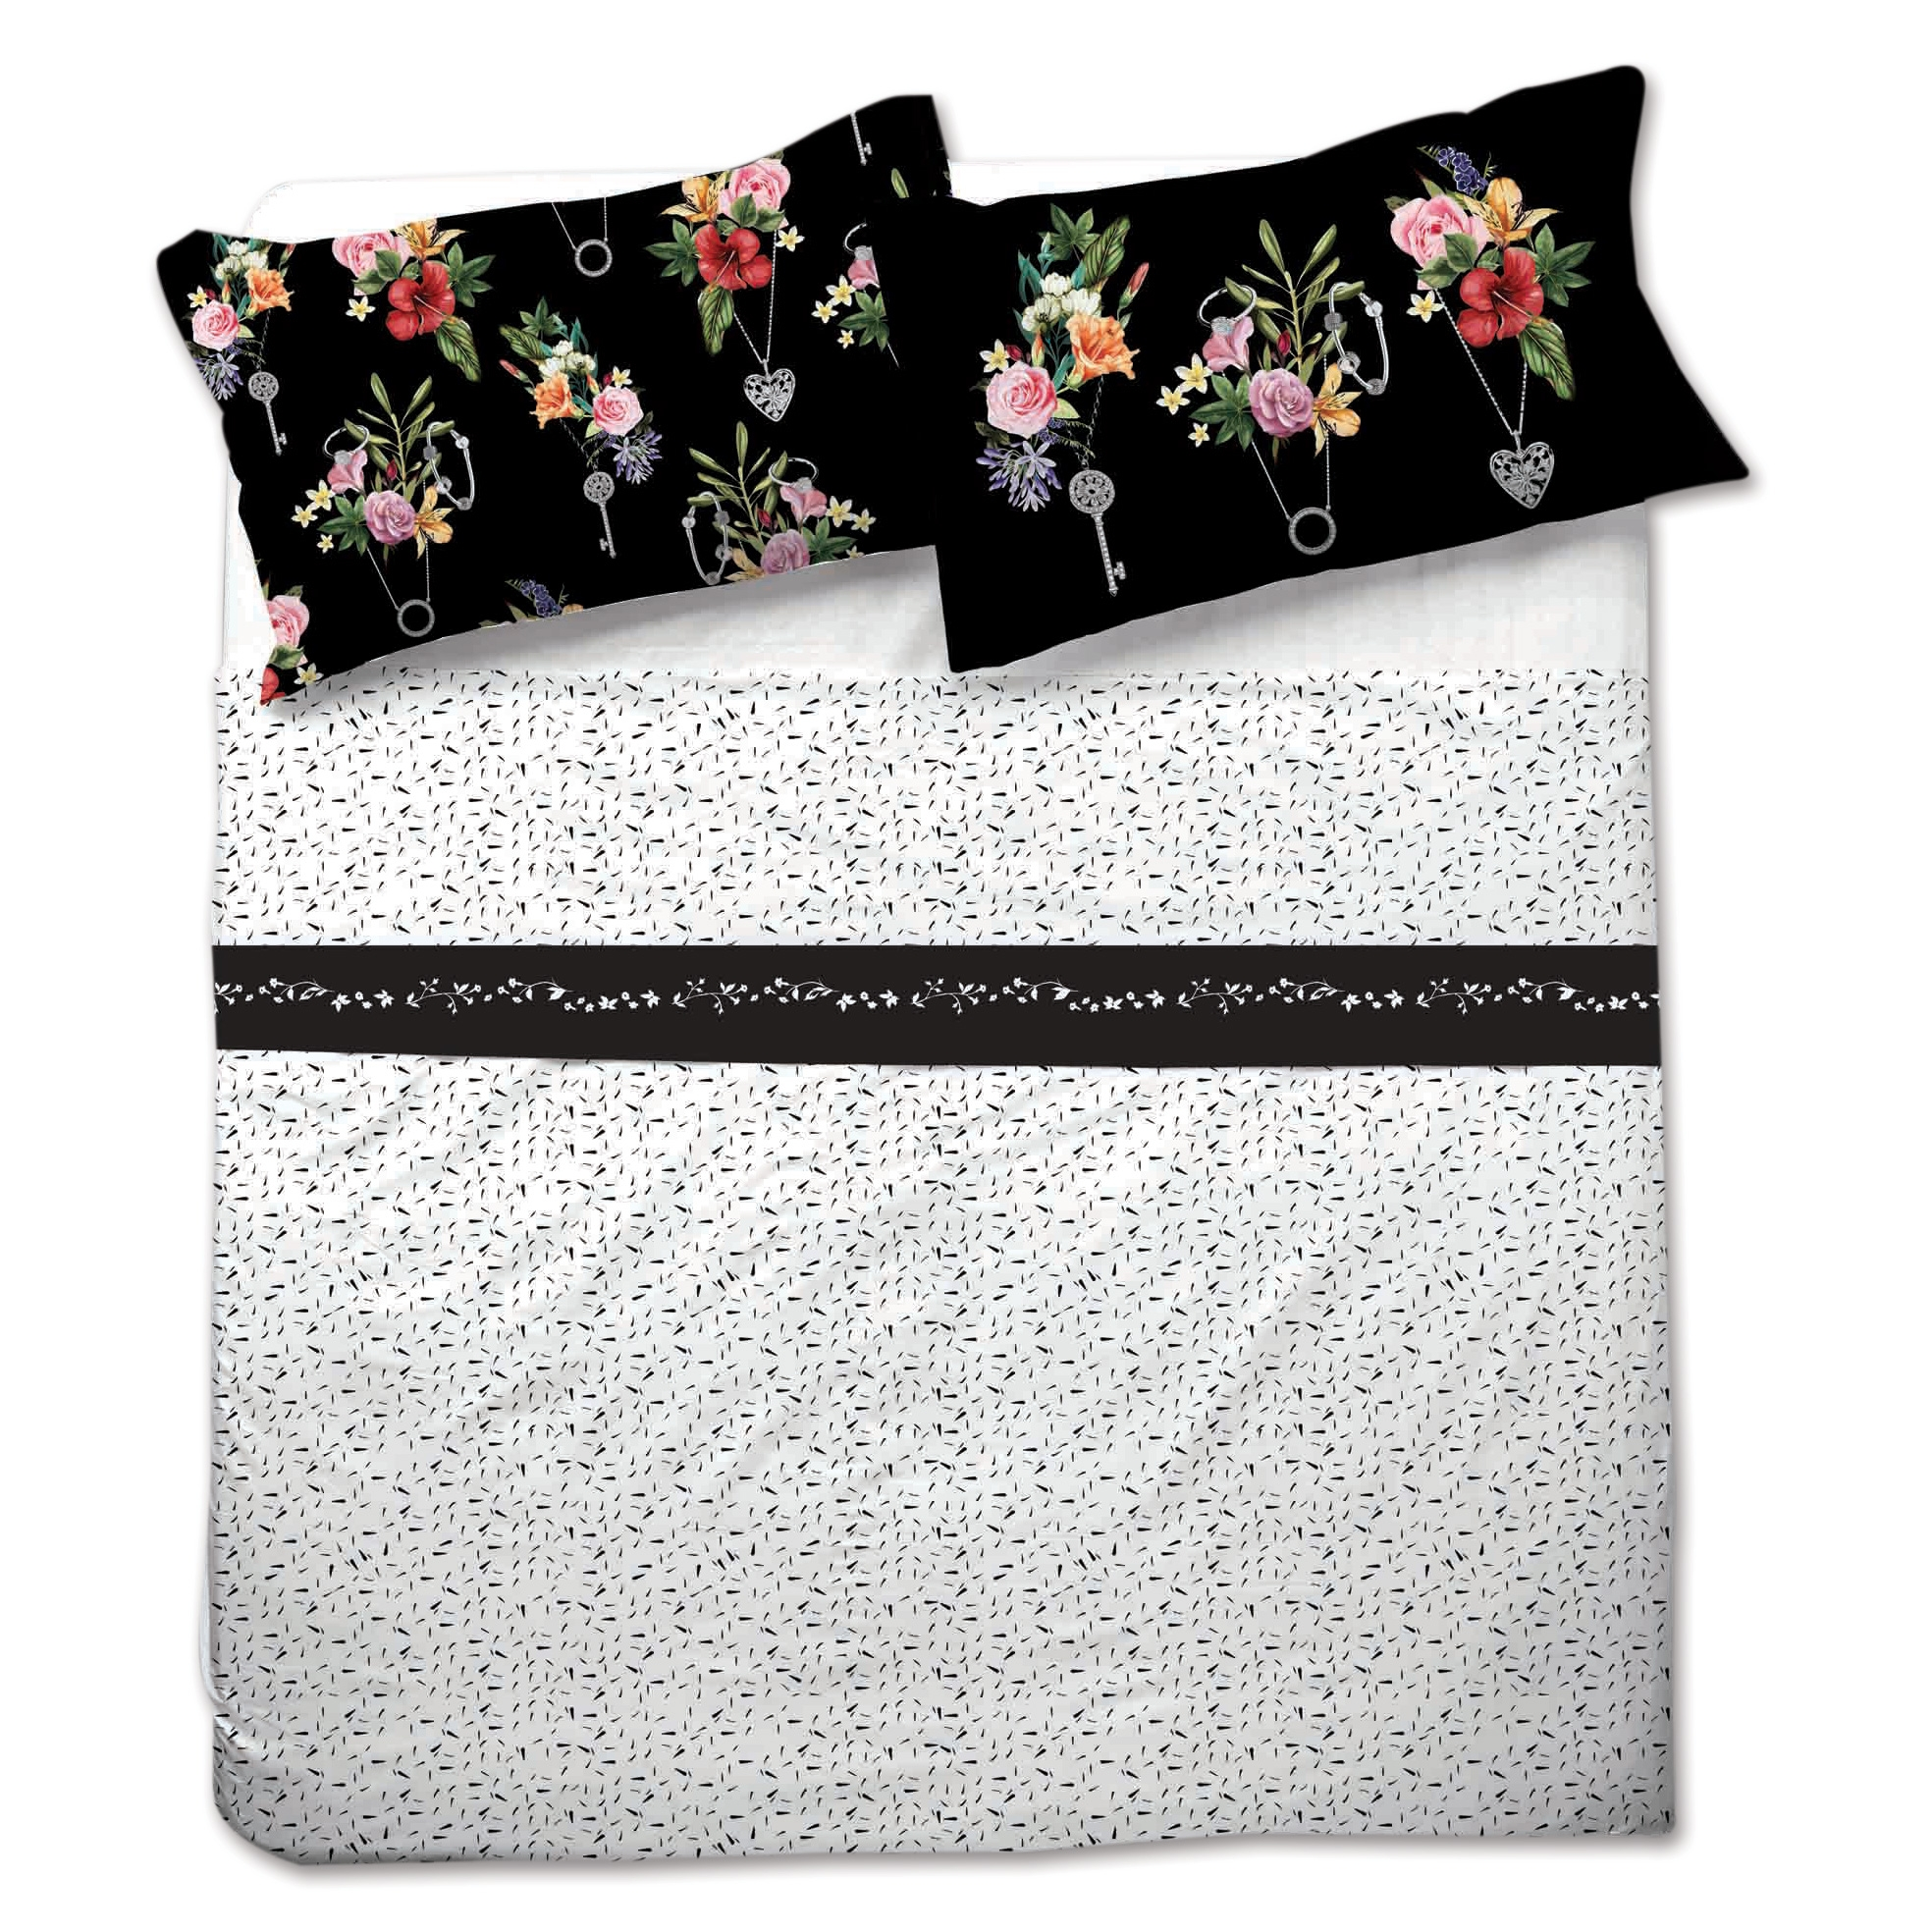 Completo lenzuola matrimoniale COOL floreale stampa digitale bianco e nero